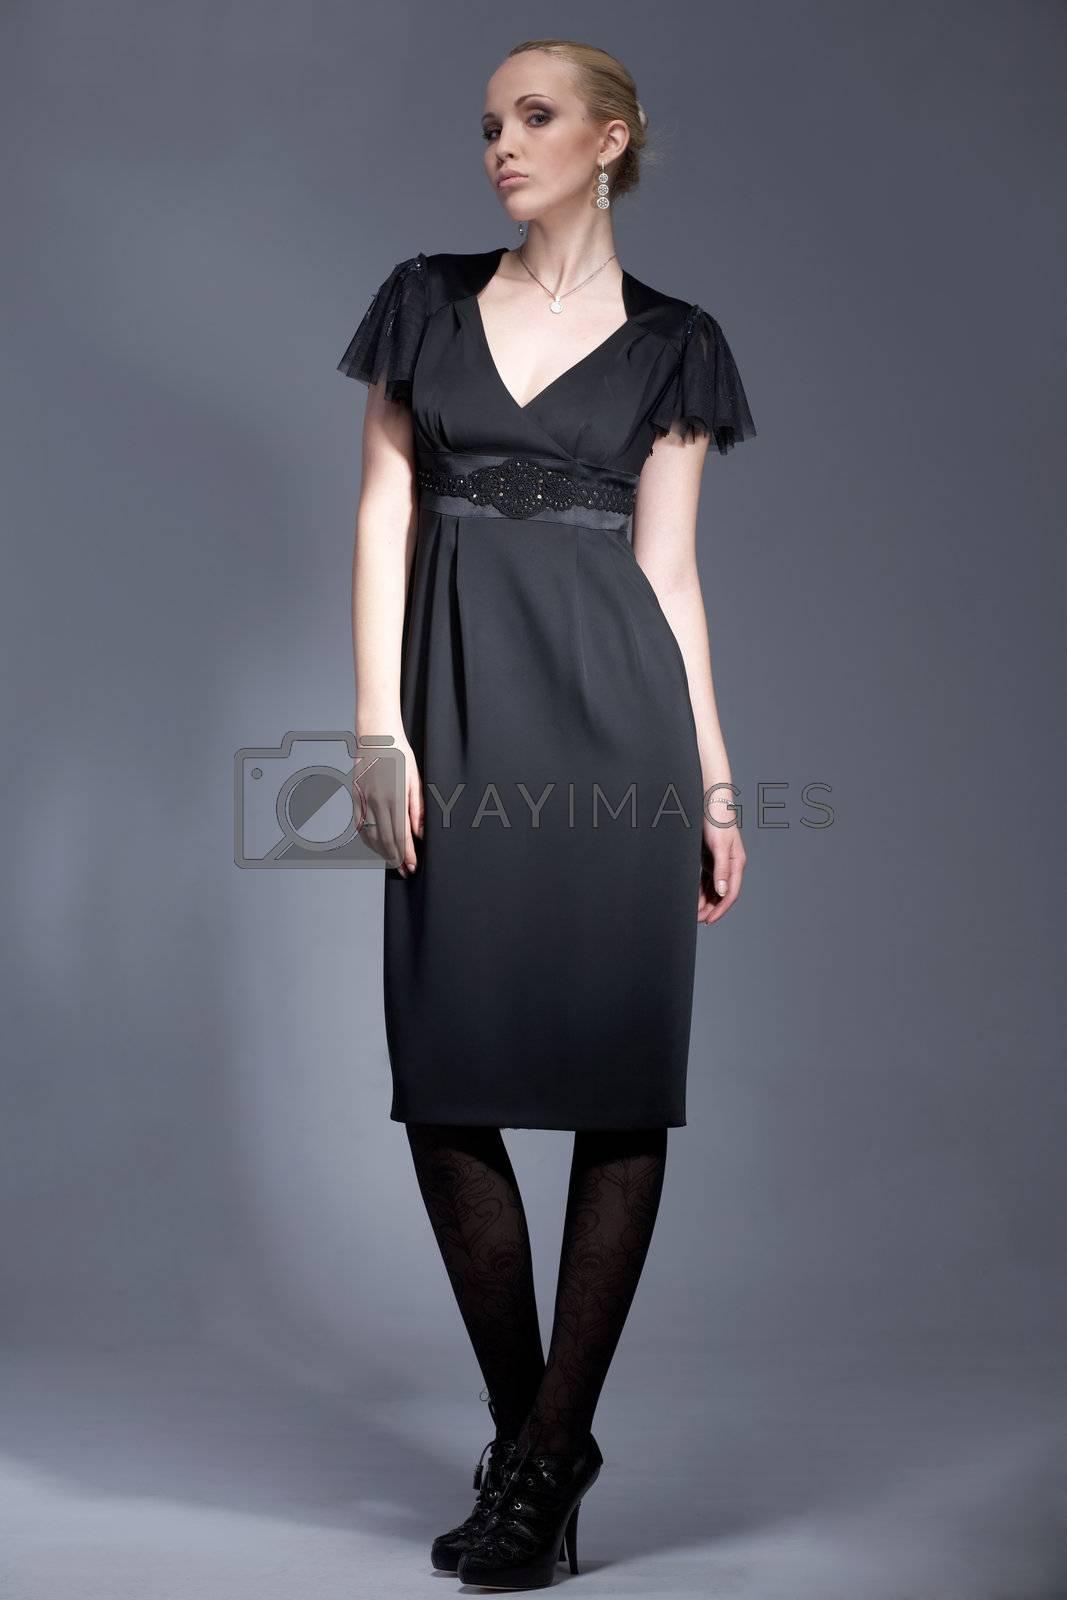 Portrait of a beautiful model dressed in black, vintage dress, posing.